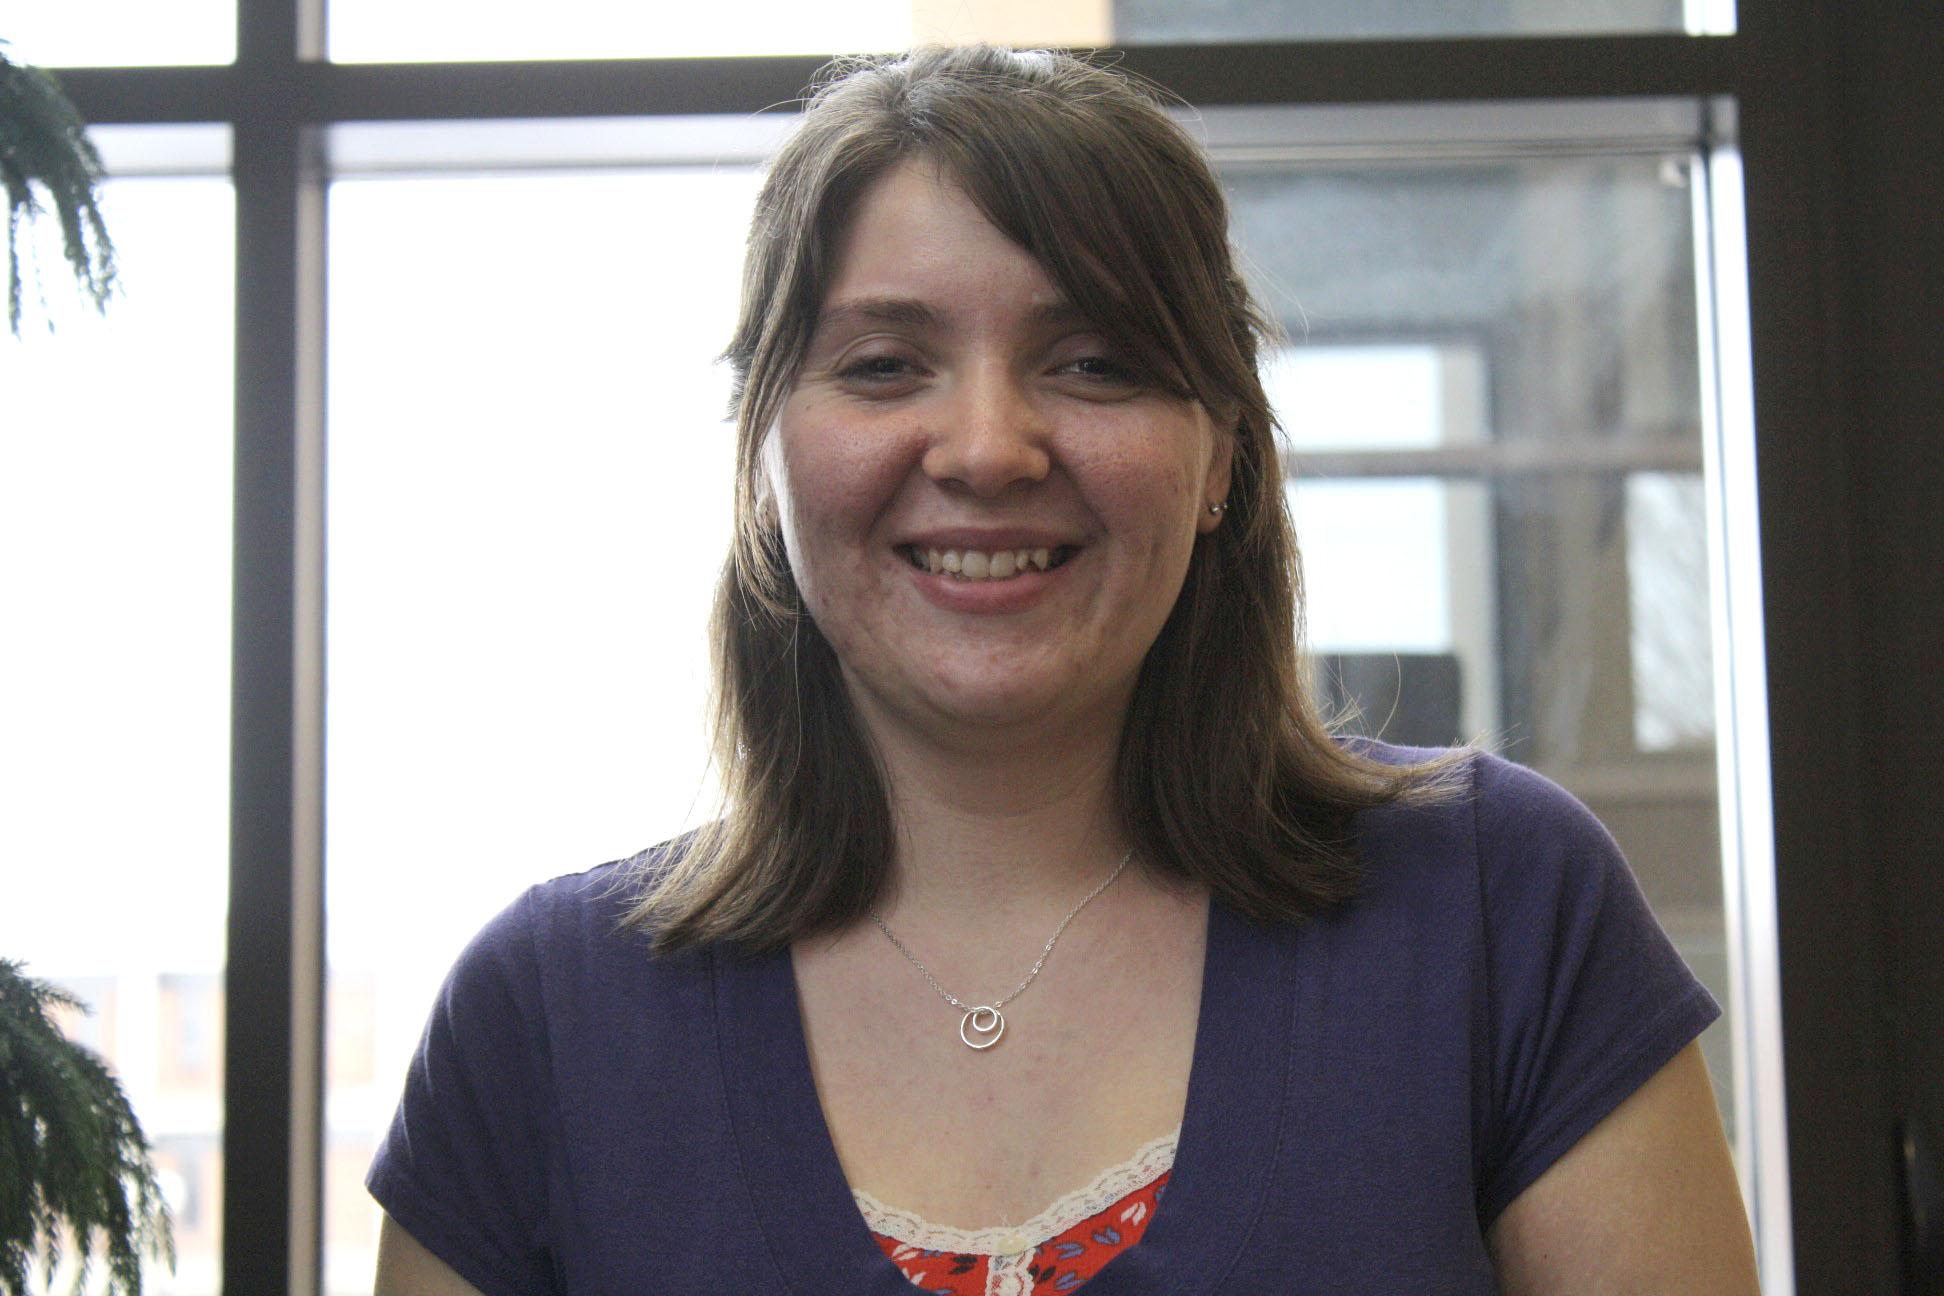 Portrait of Kimberly Lindgren